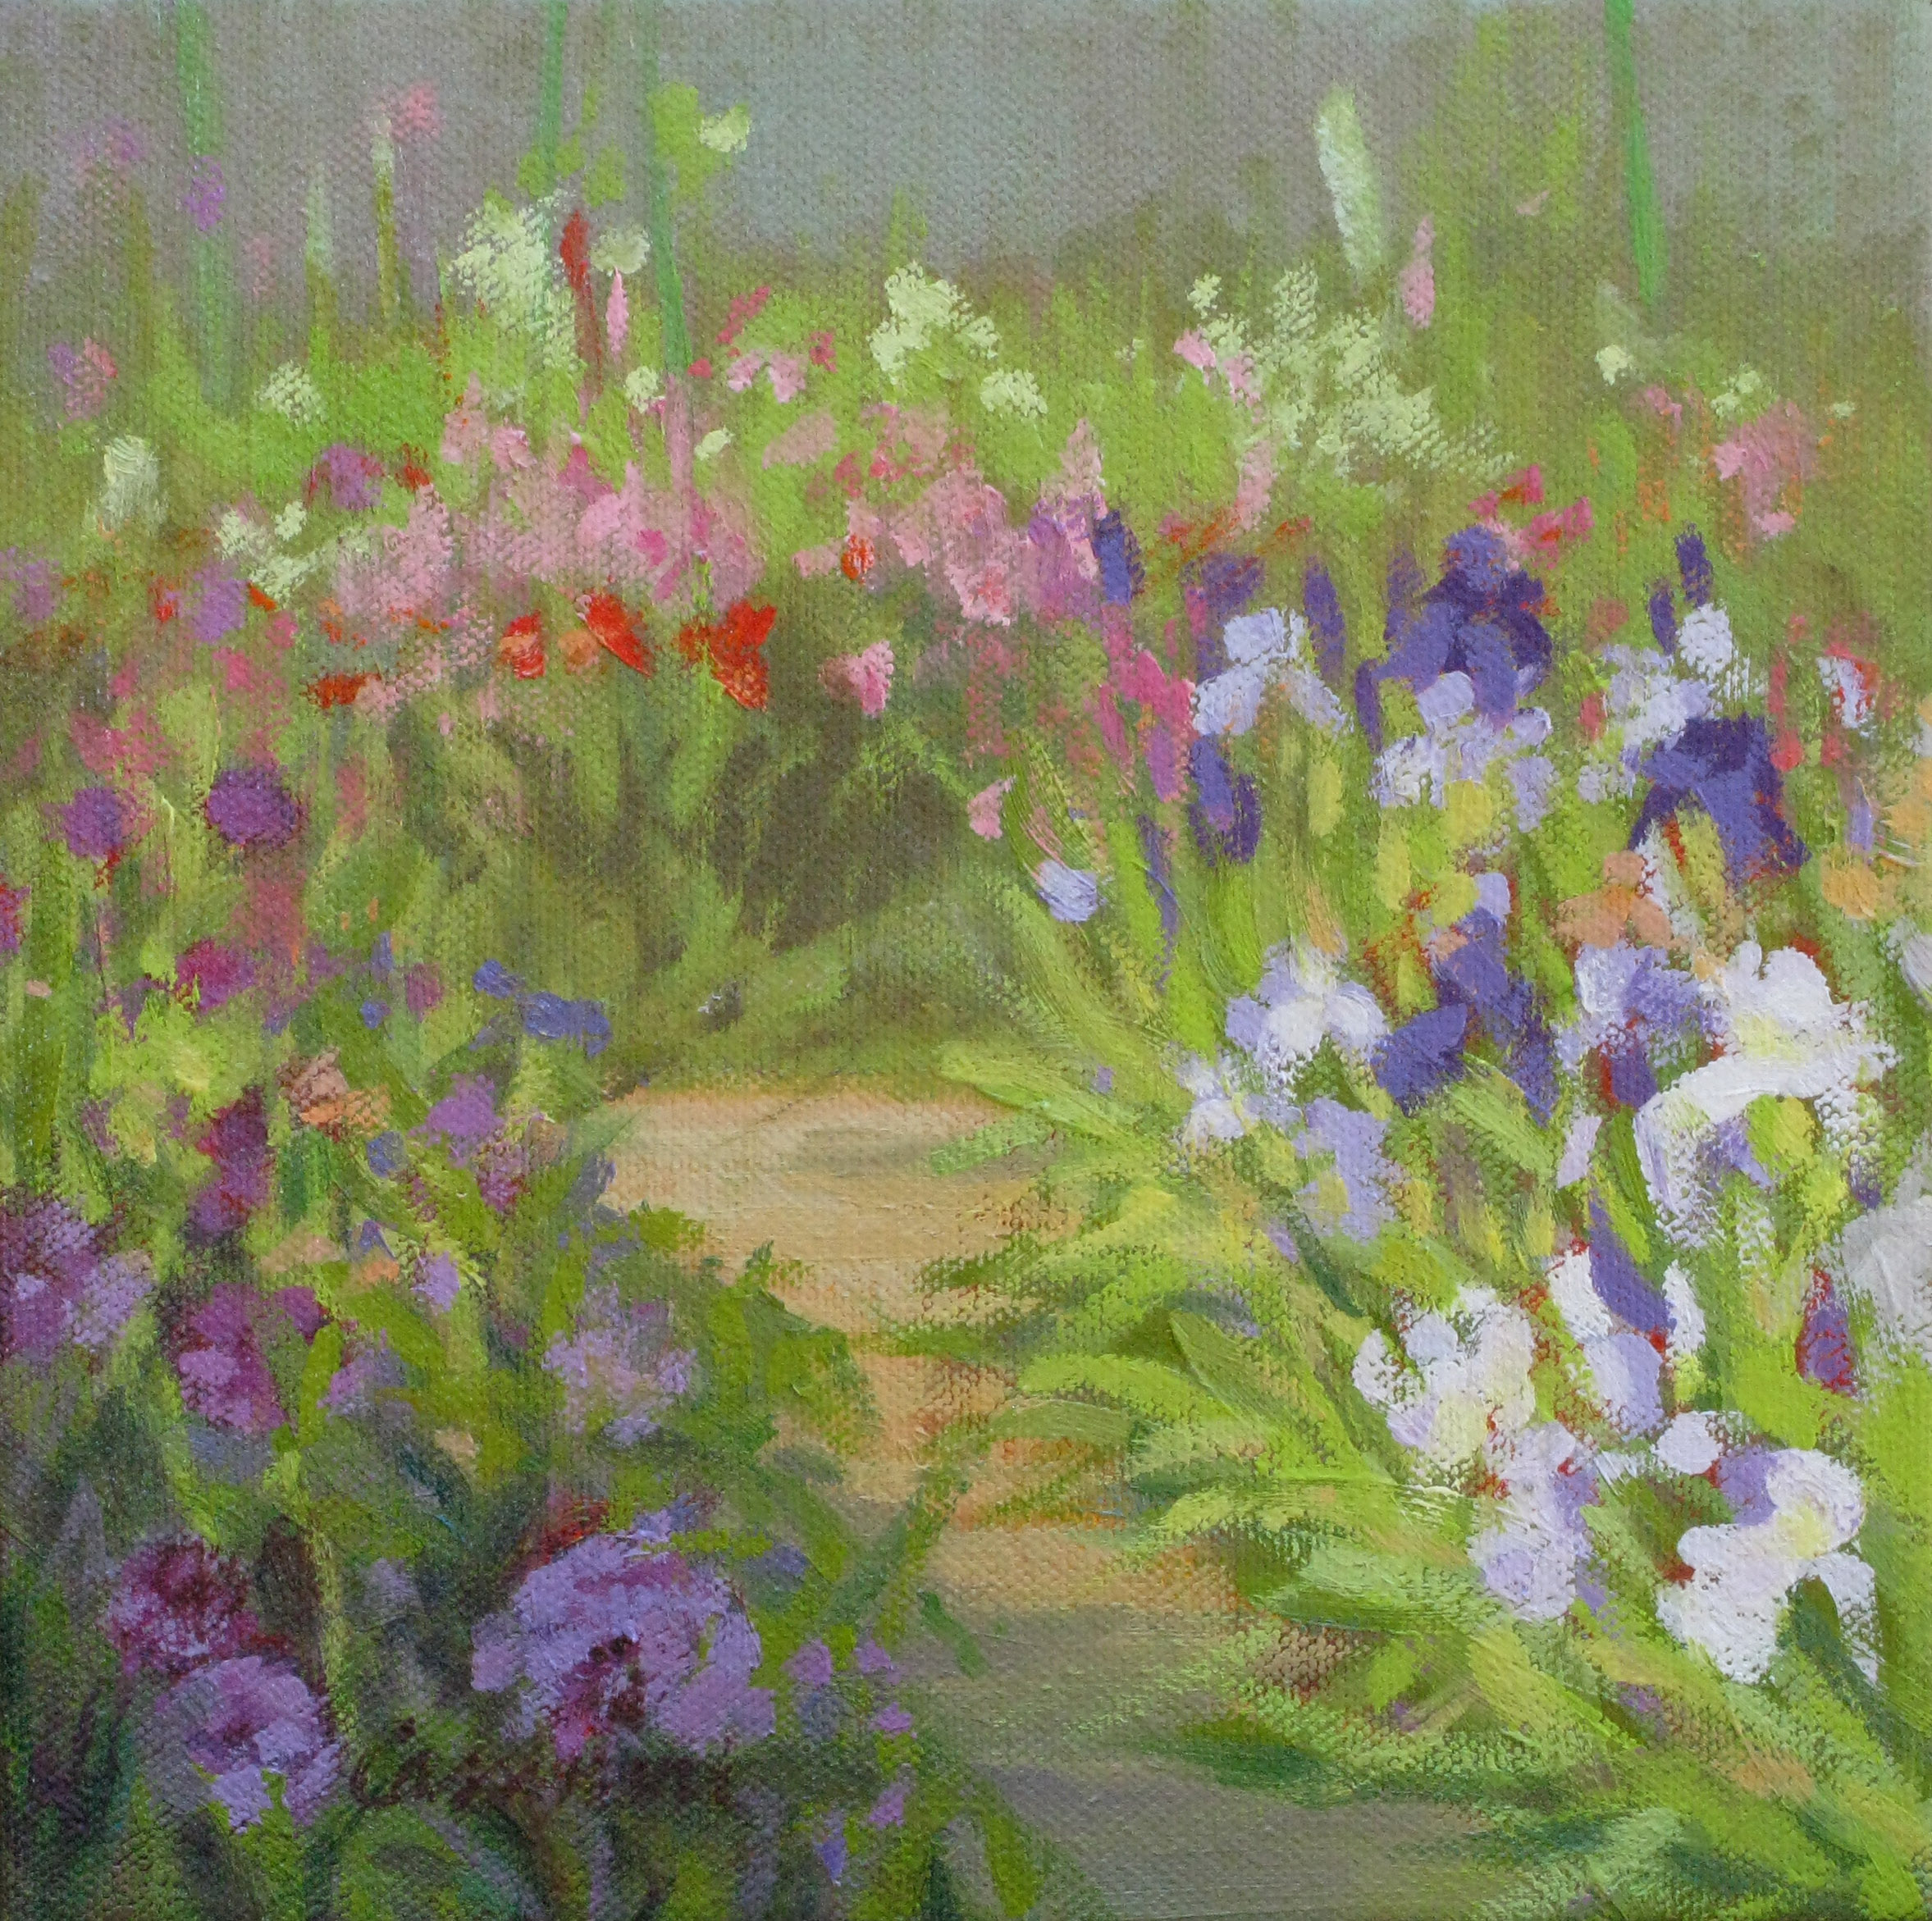 Cassinari_GardenPath,Giverny_oil_8x8_$300.jpg